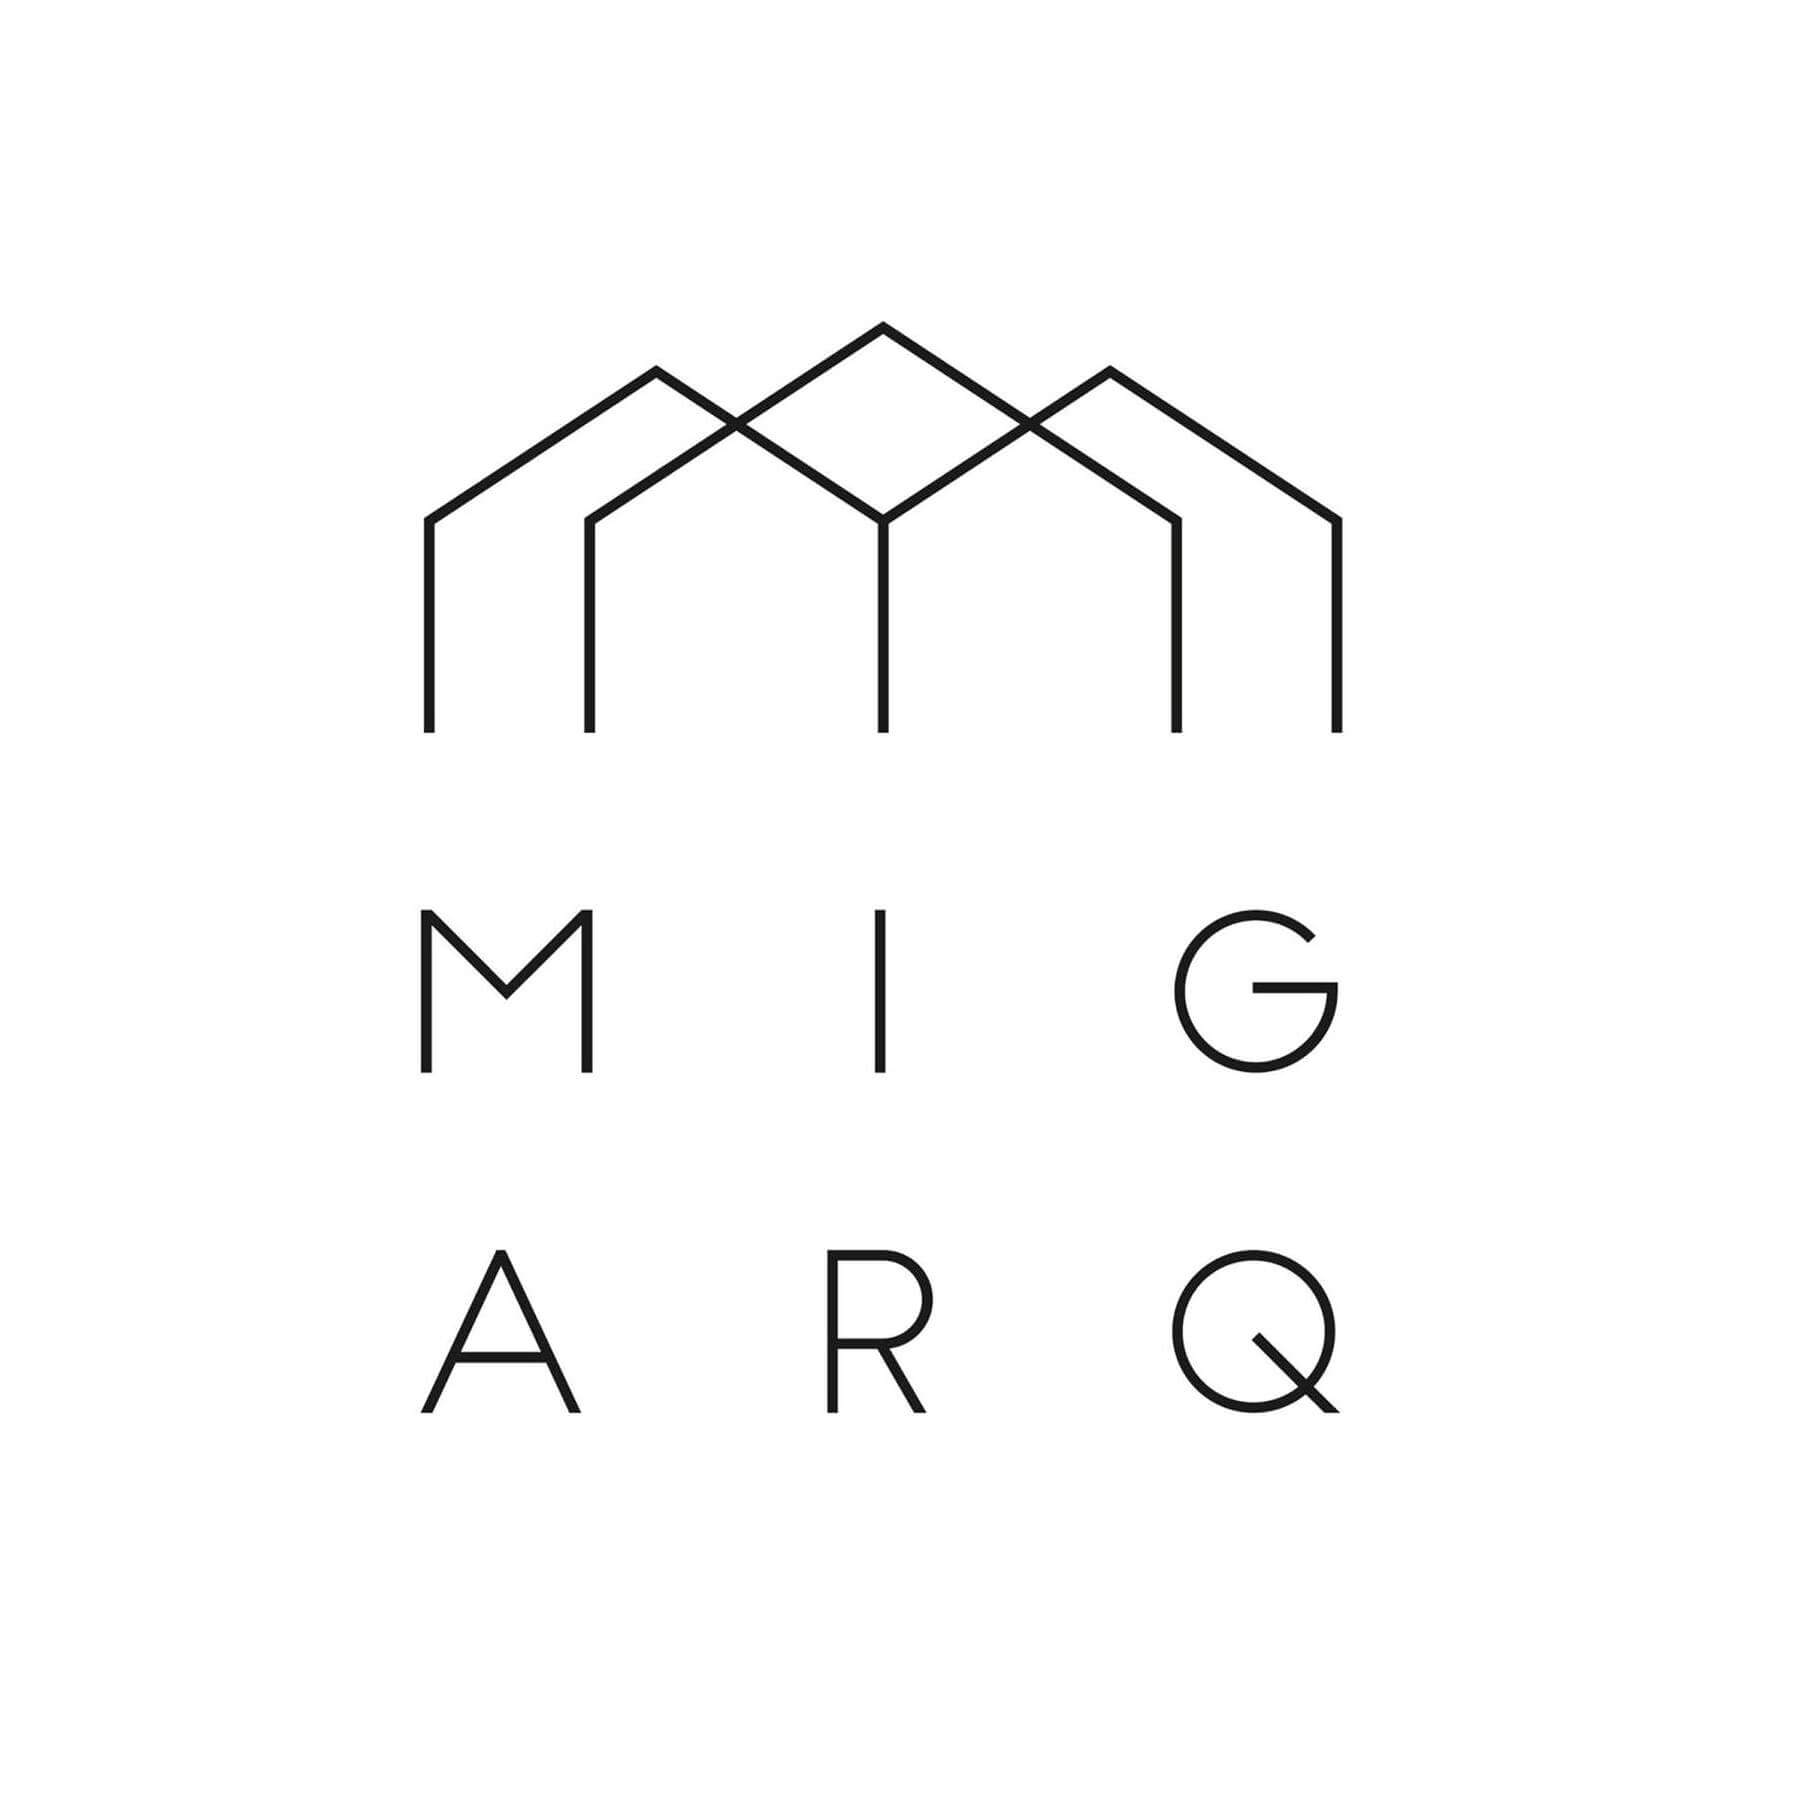 MIGARQ